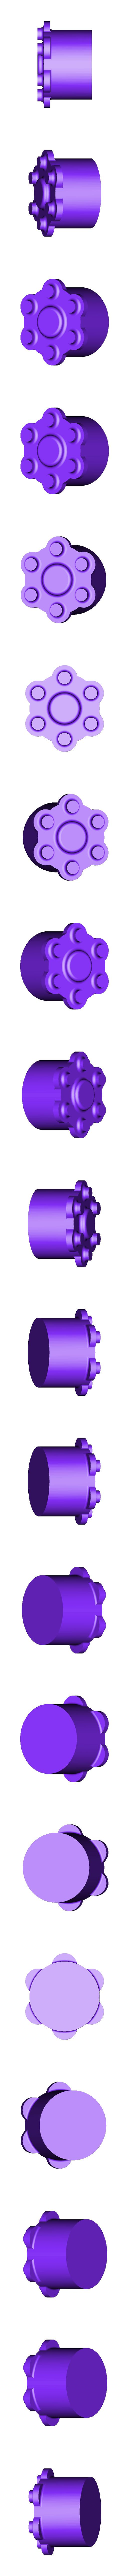 pneu stock moyeu jante 101 11.STL Download STL file AXIAL SCX24 Trail Grappler M/T rim offset 7mm military type • 3D printable template, lulu3Dbuilder